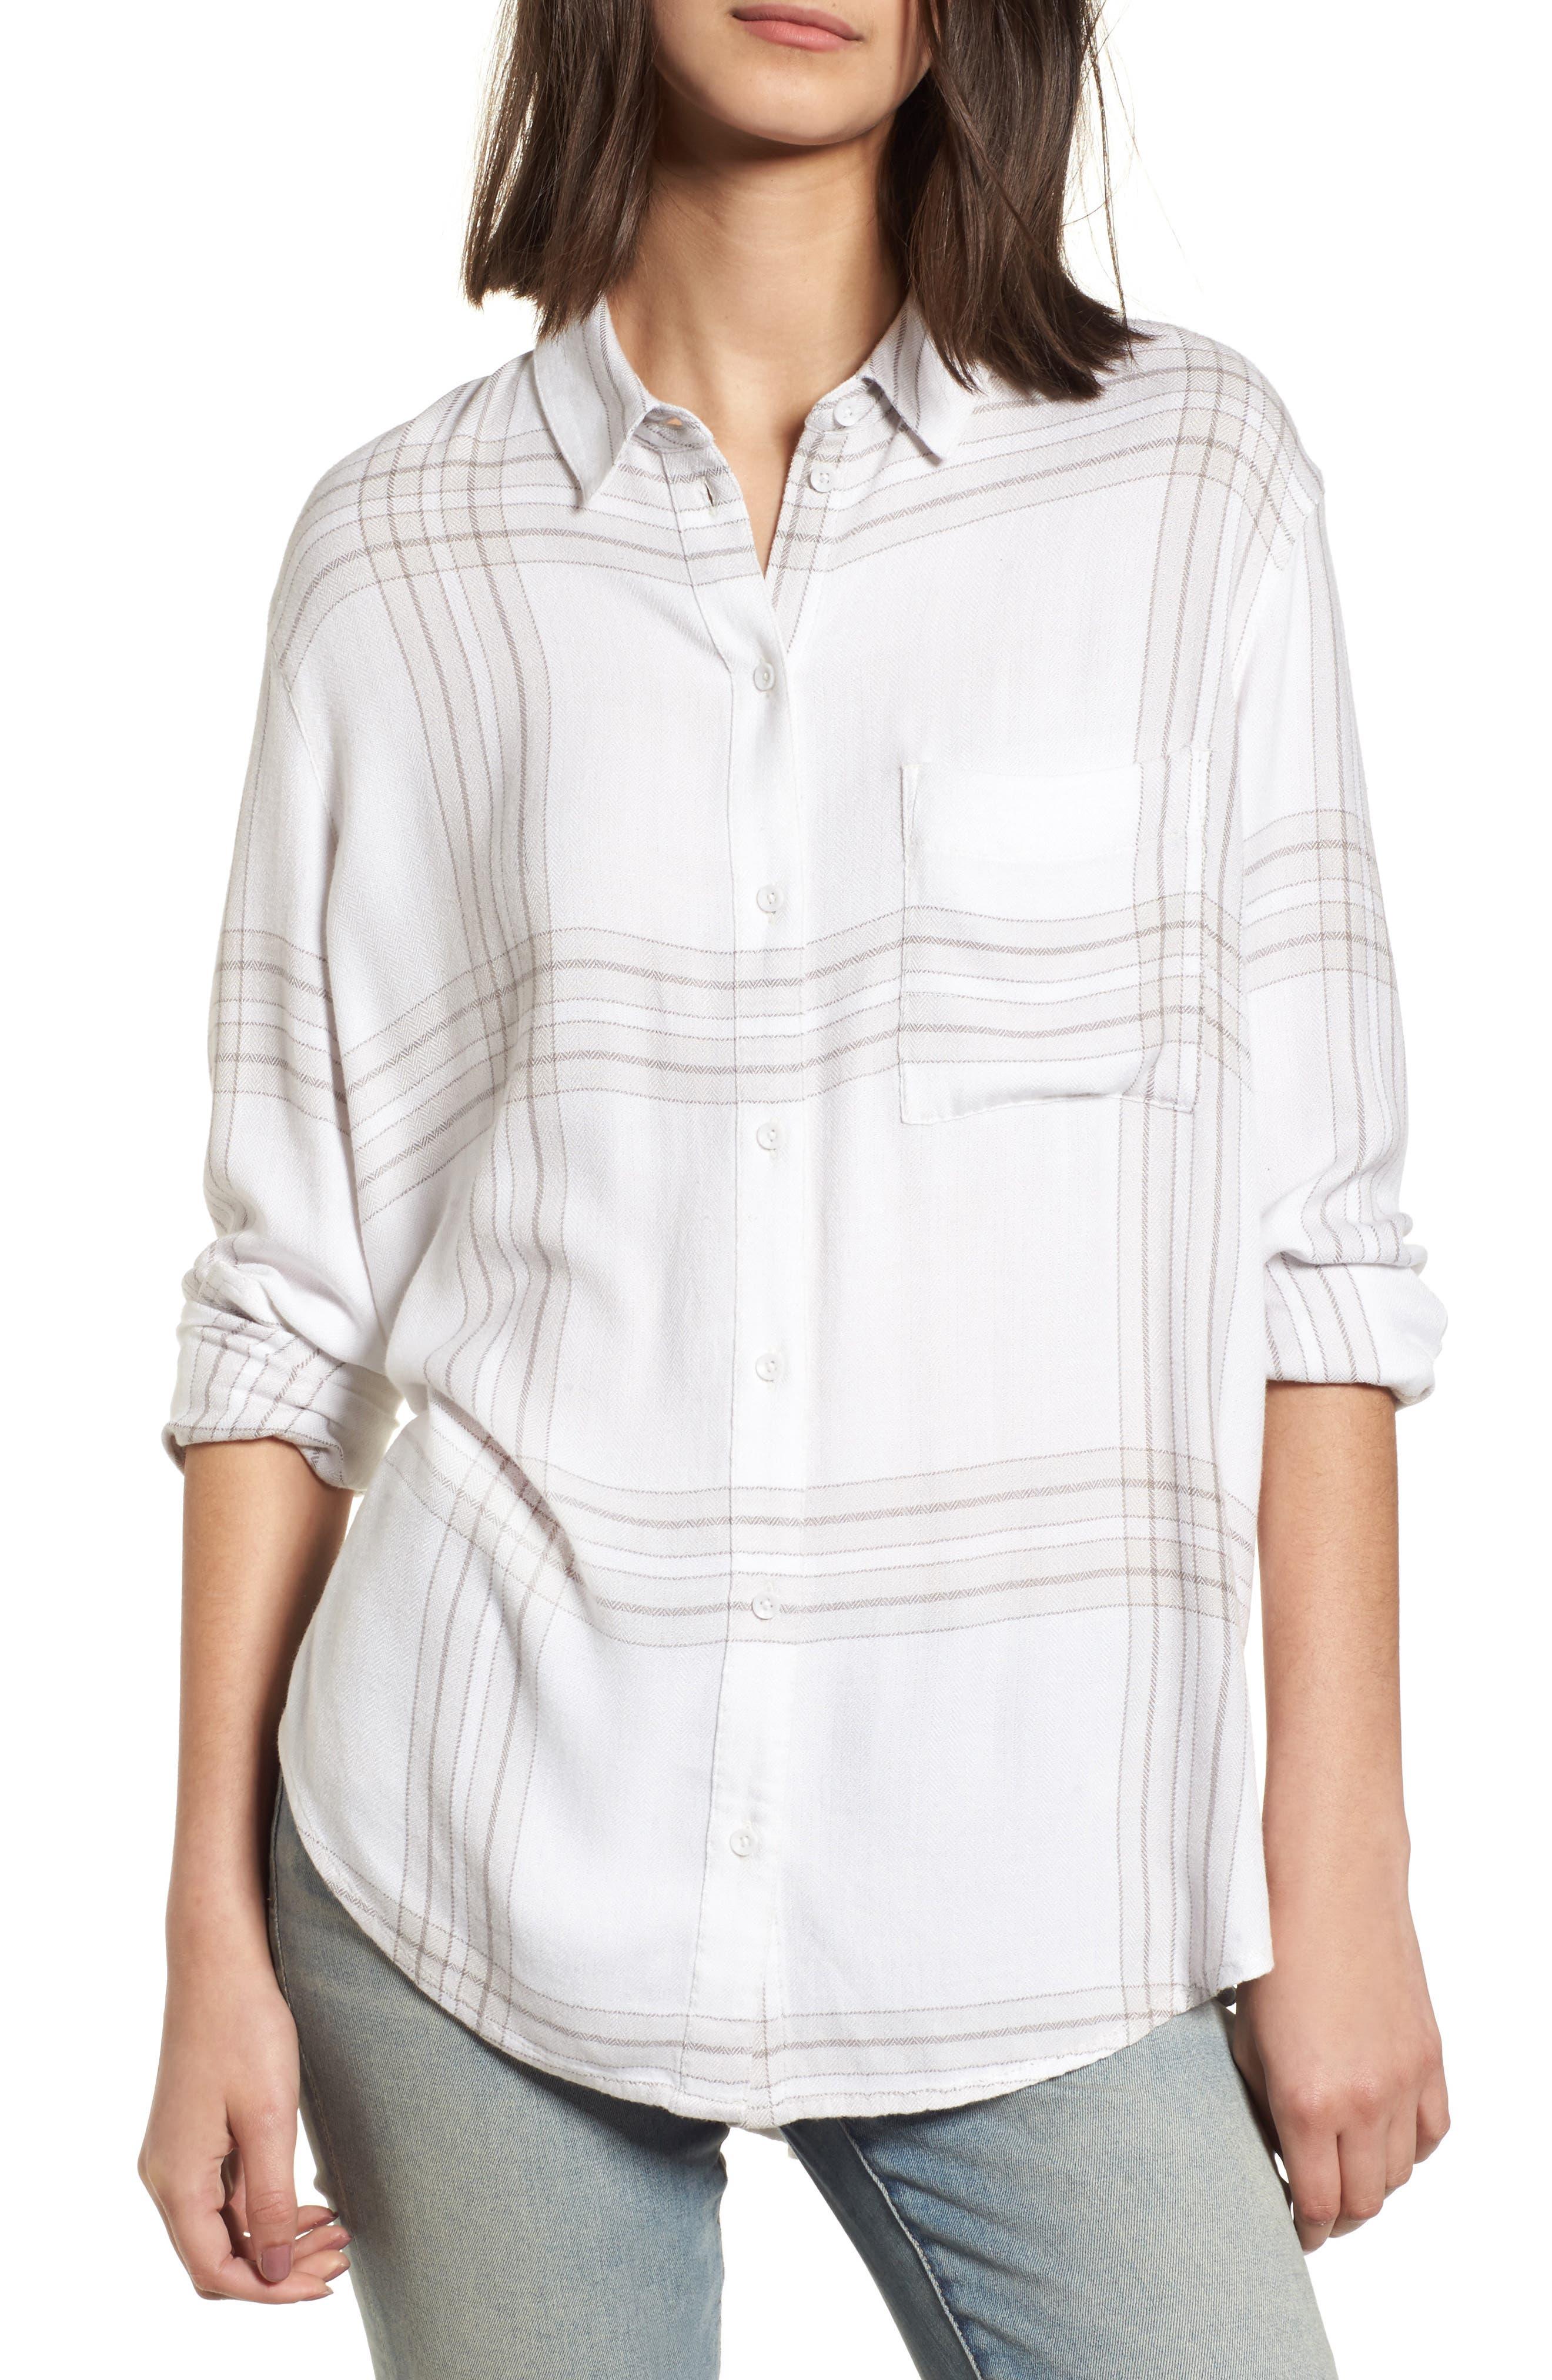 Alternate Image 1 Selected - Treasure & Bond Drapey Plaid Shirt